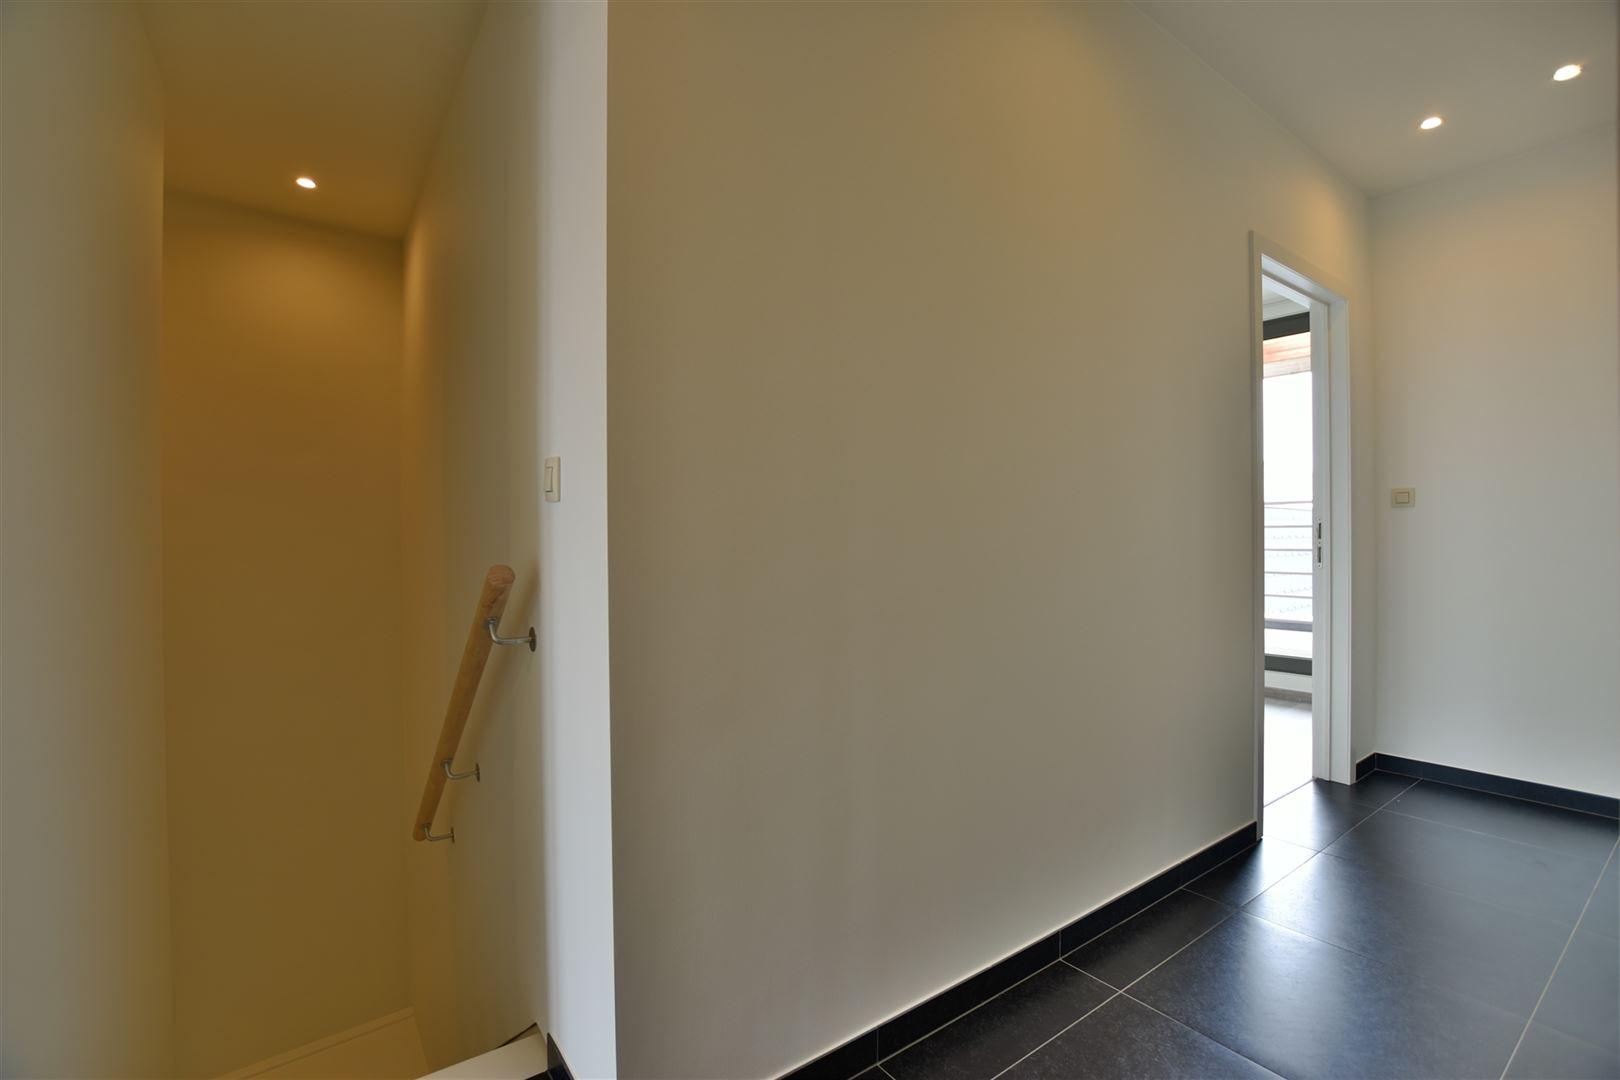 Foto 26 : Duplex/Penthouse te 9200 Sint-Gillis-bij-Dendermonde (België) - Prijs € 278.000